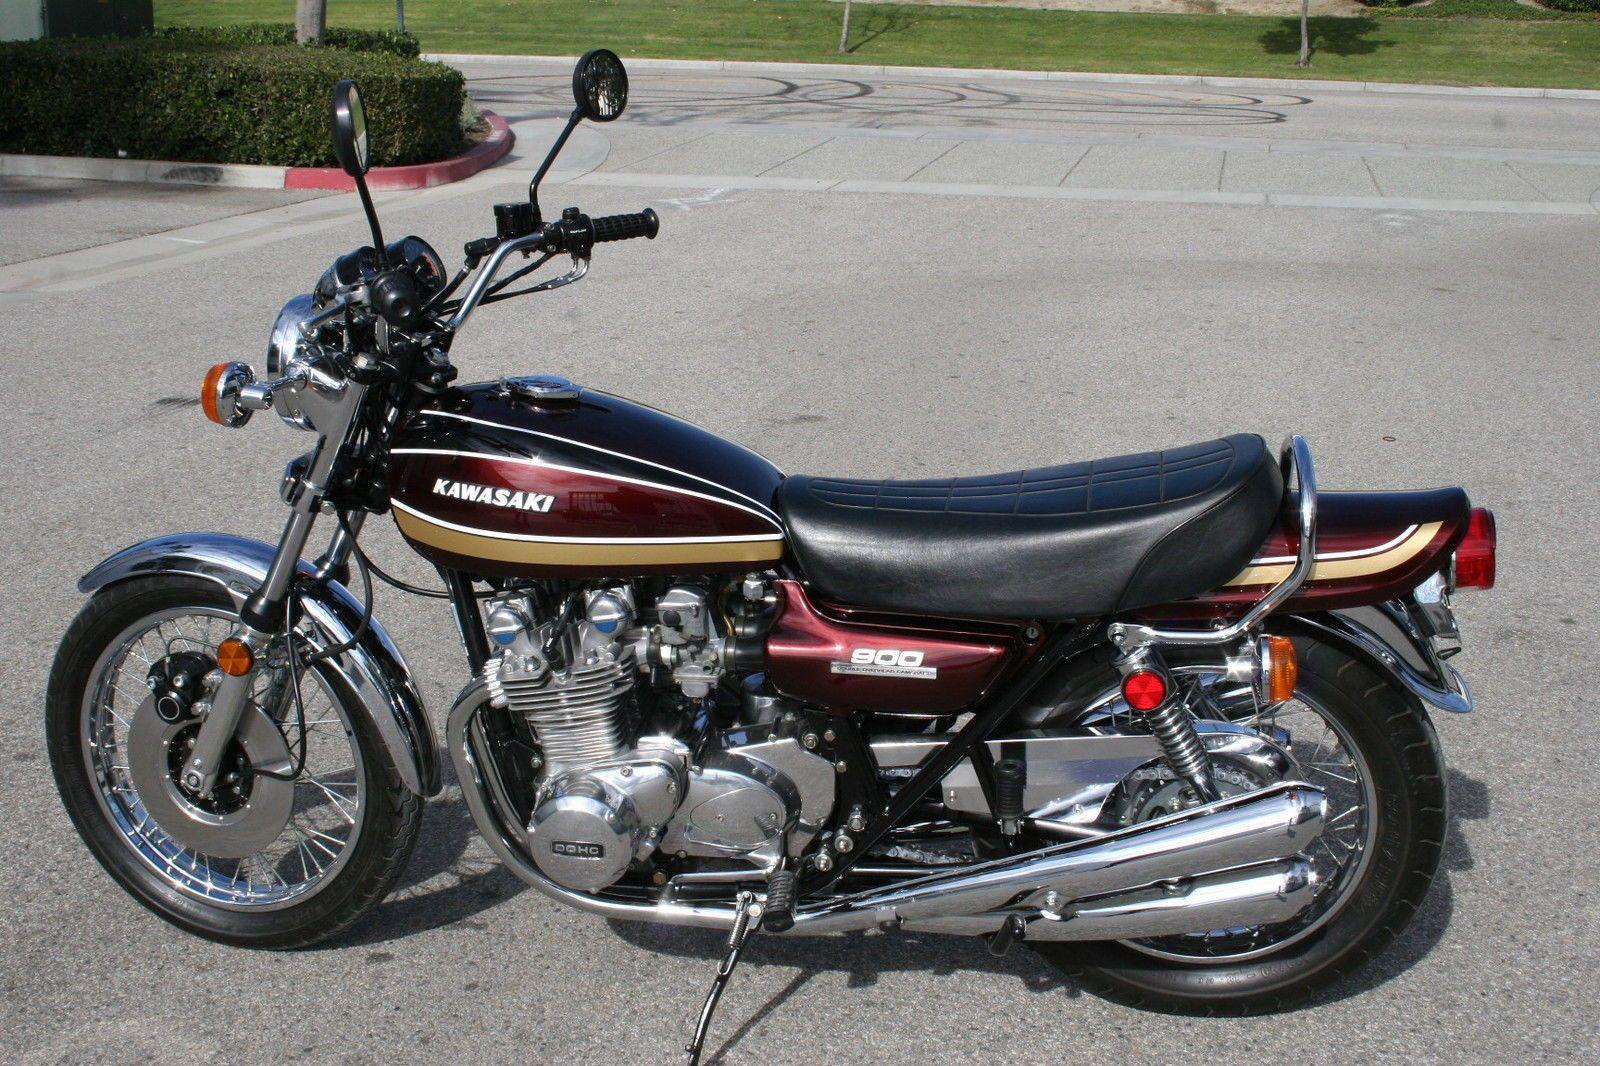 1975 KAWASAKI Z1B 900 GENUINE UK BIKE SAME ERA AS Z1 Z900